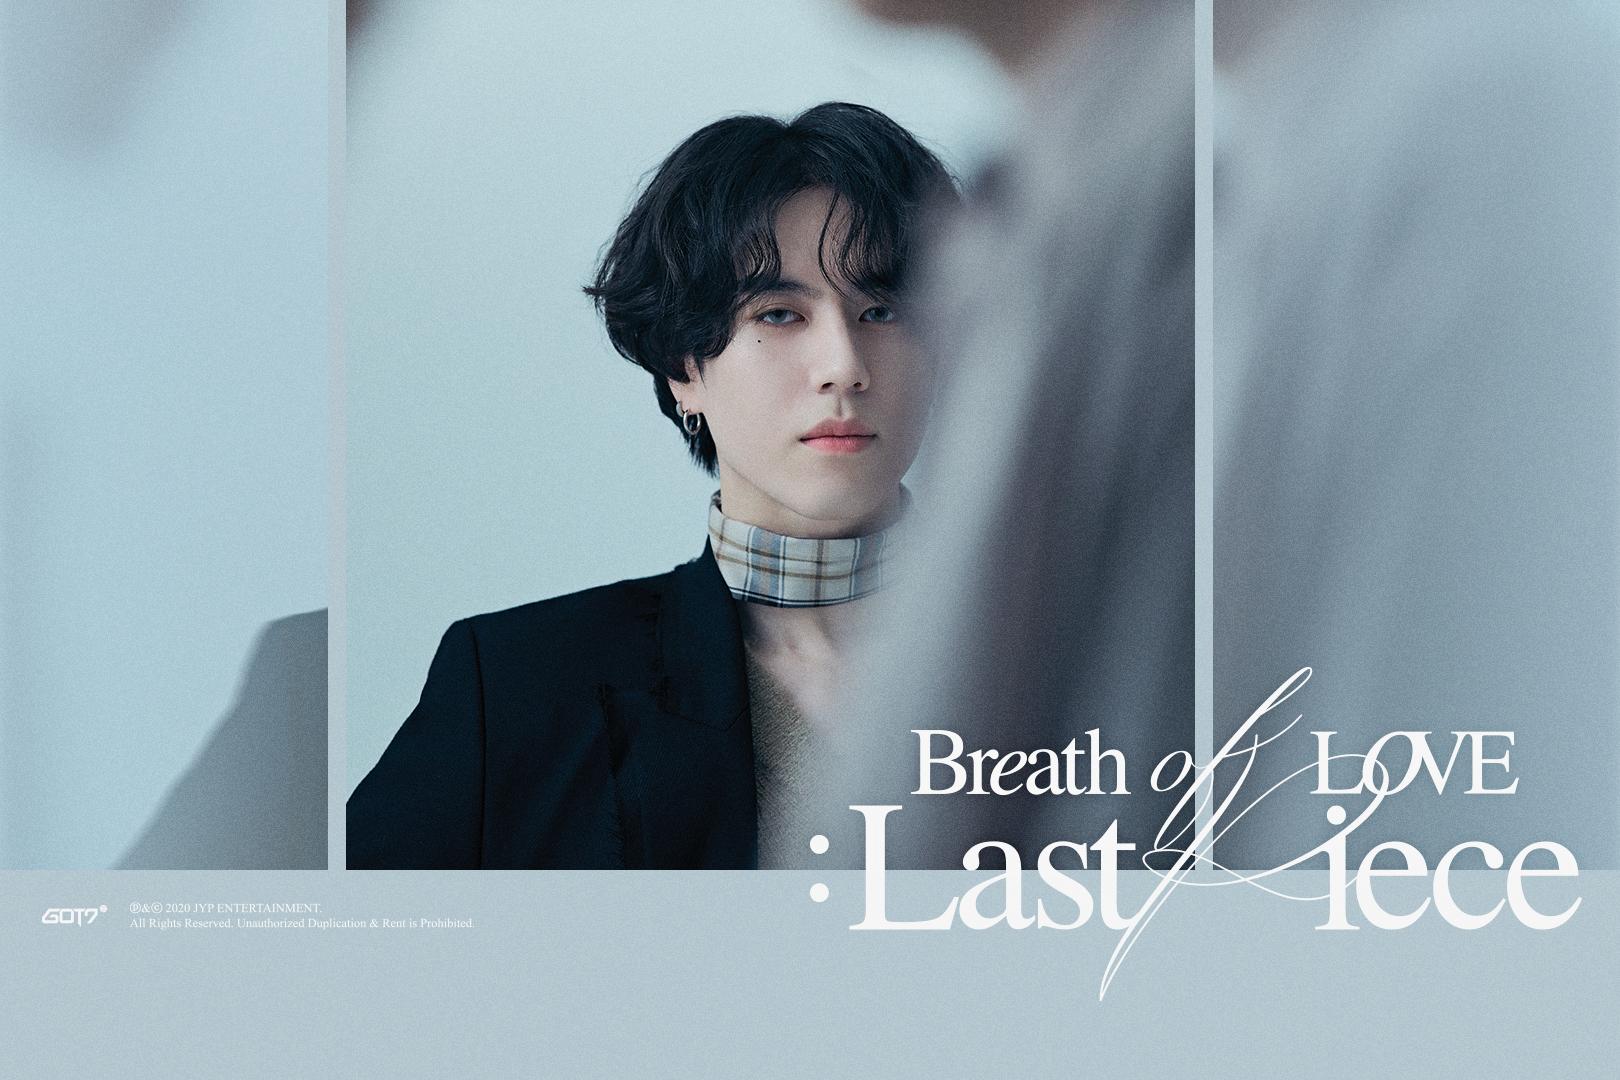 GOT7 유겸, 신곡 'Breath (넌 날 숨 쉬게 해)' 티저 공개... 넘치는 치명美